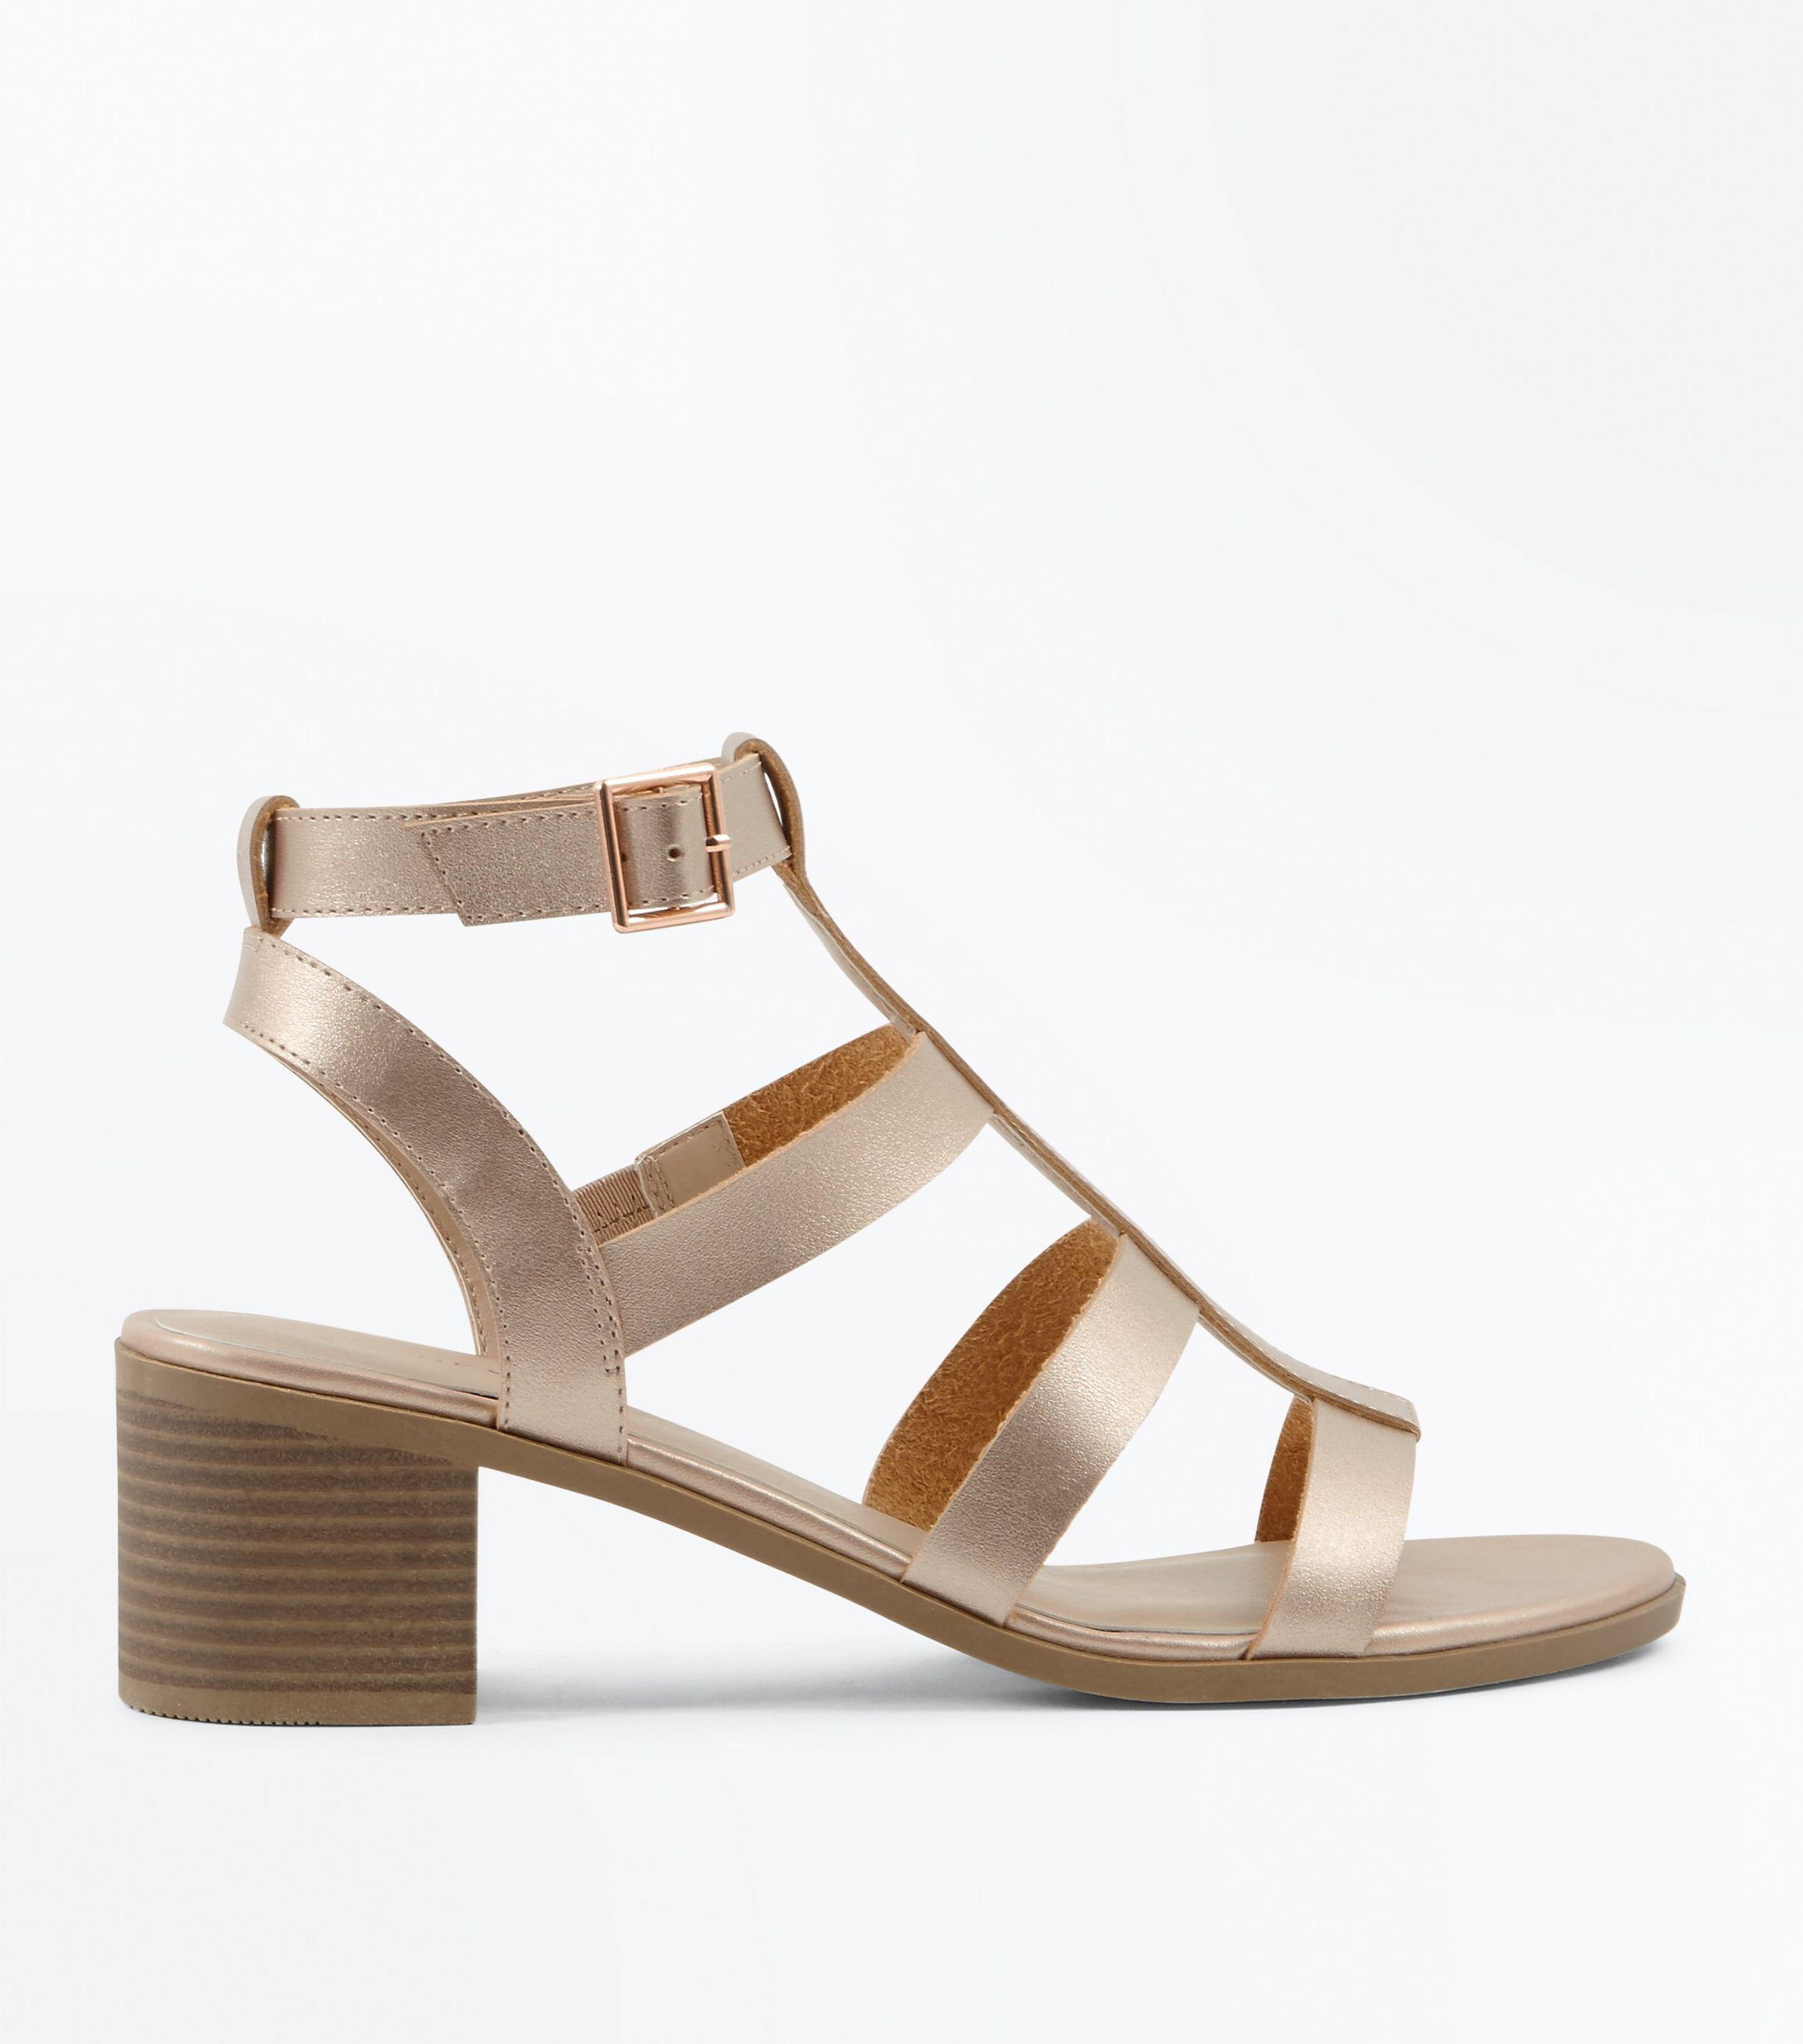 c96b865c6fc New Look Rose Gold Low Block Heel Gladiator Sandals in Pink - Lyst